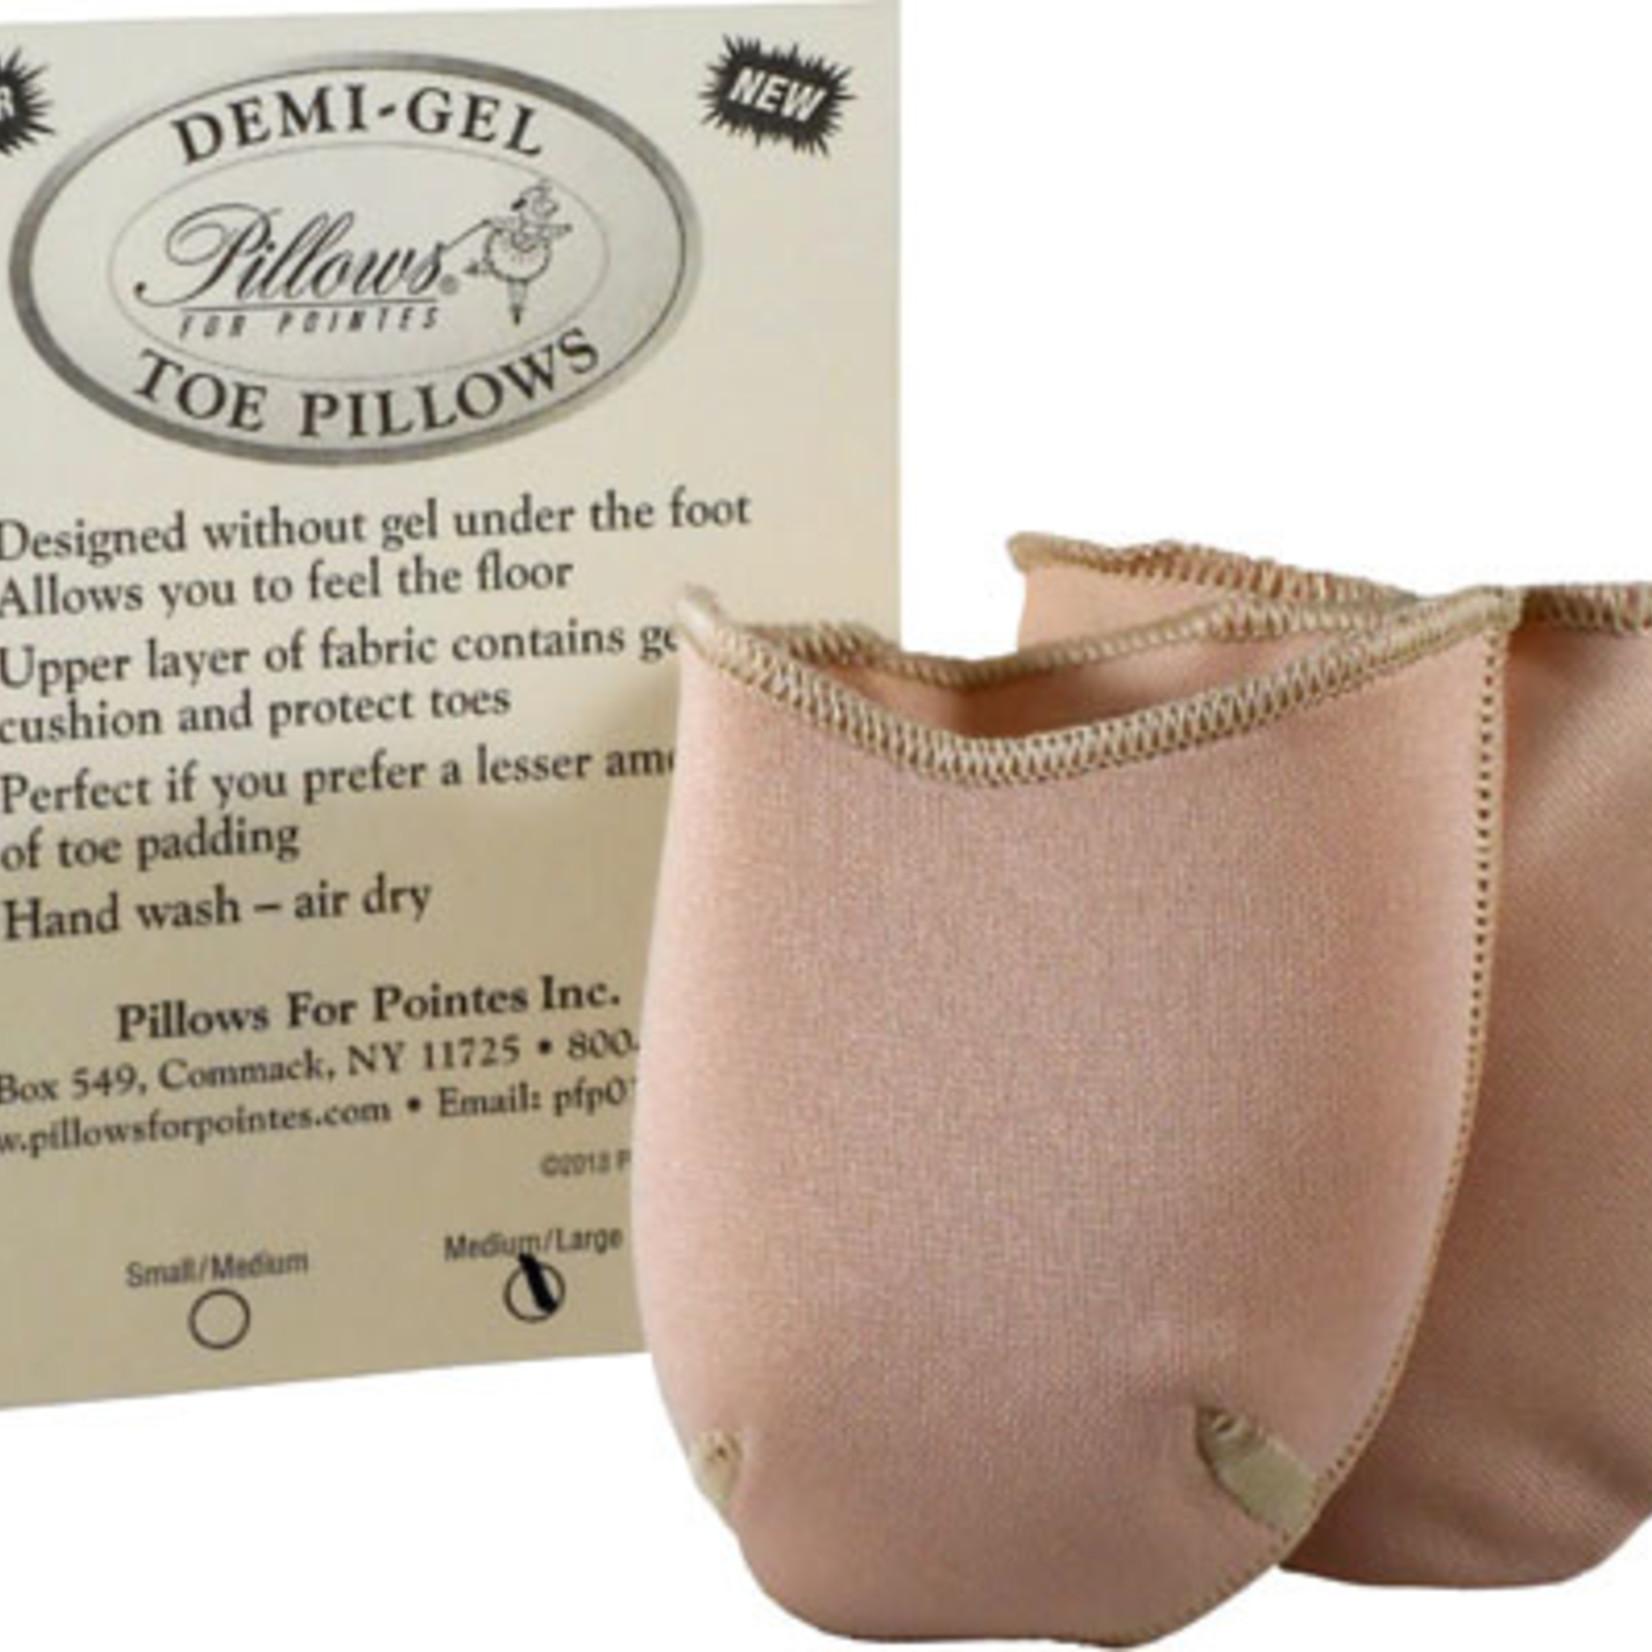 Pillows for Pointes Pillows for Pointes Demi Gel Toe Pillows